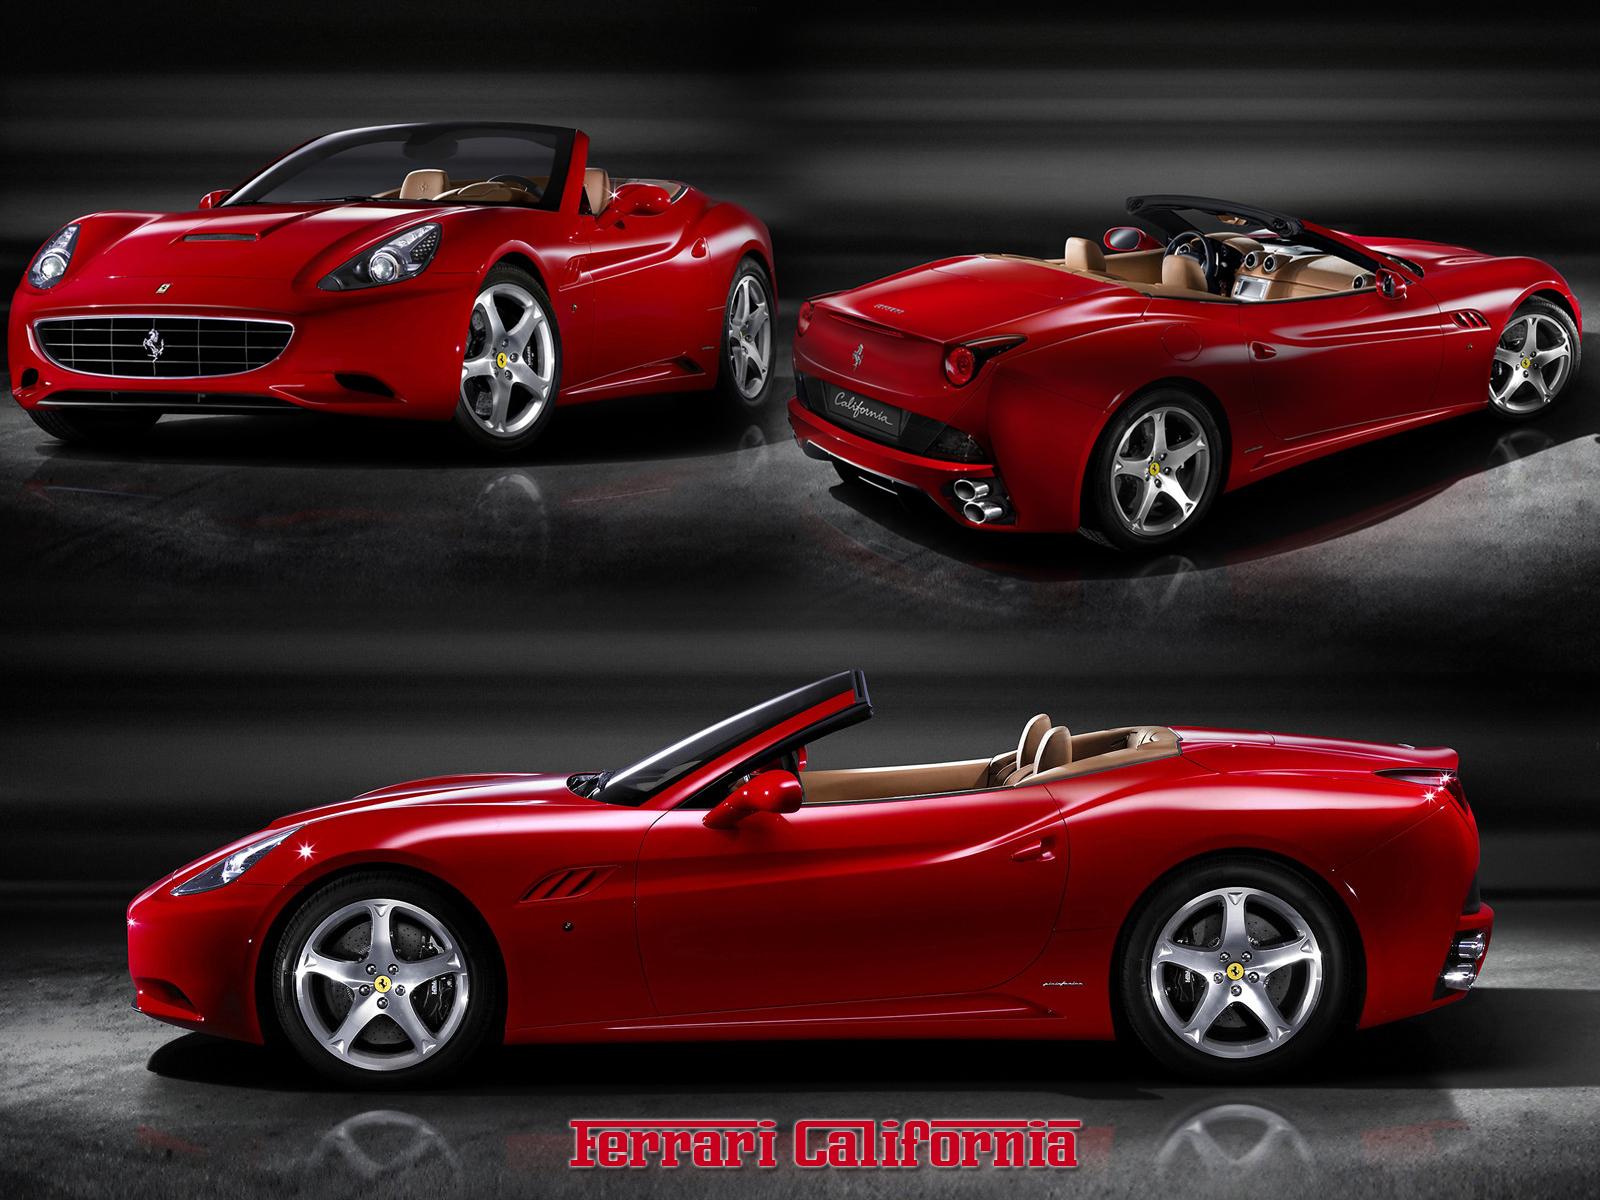 New Best Car: Ferrari California